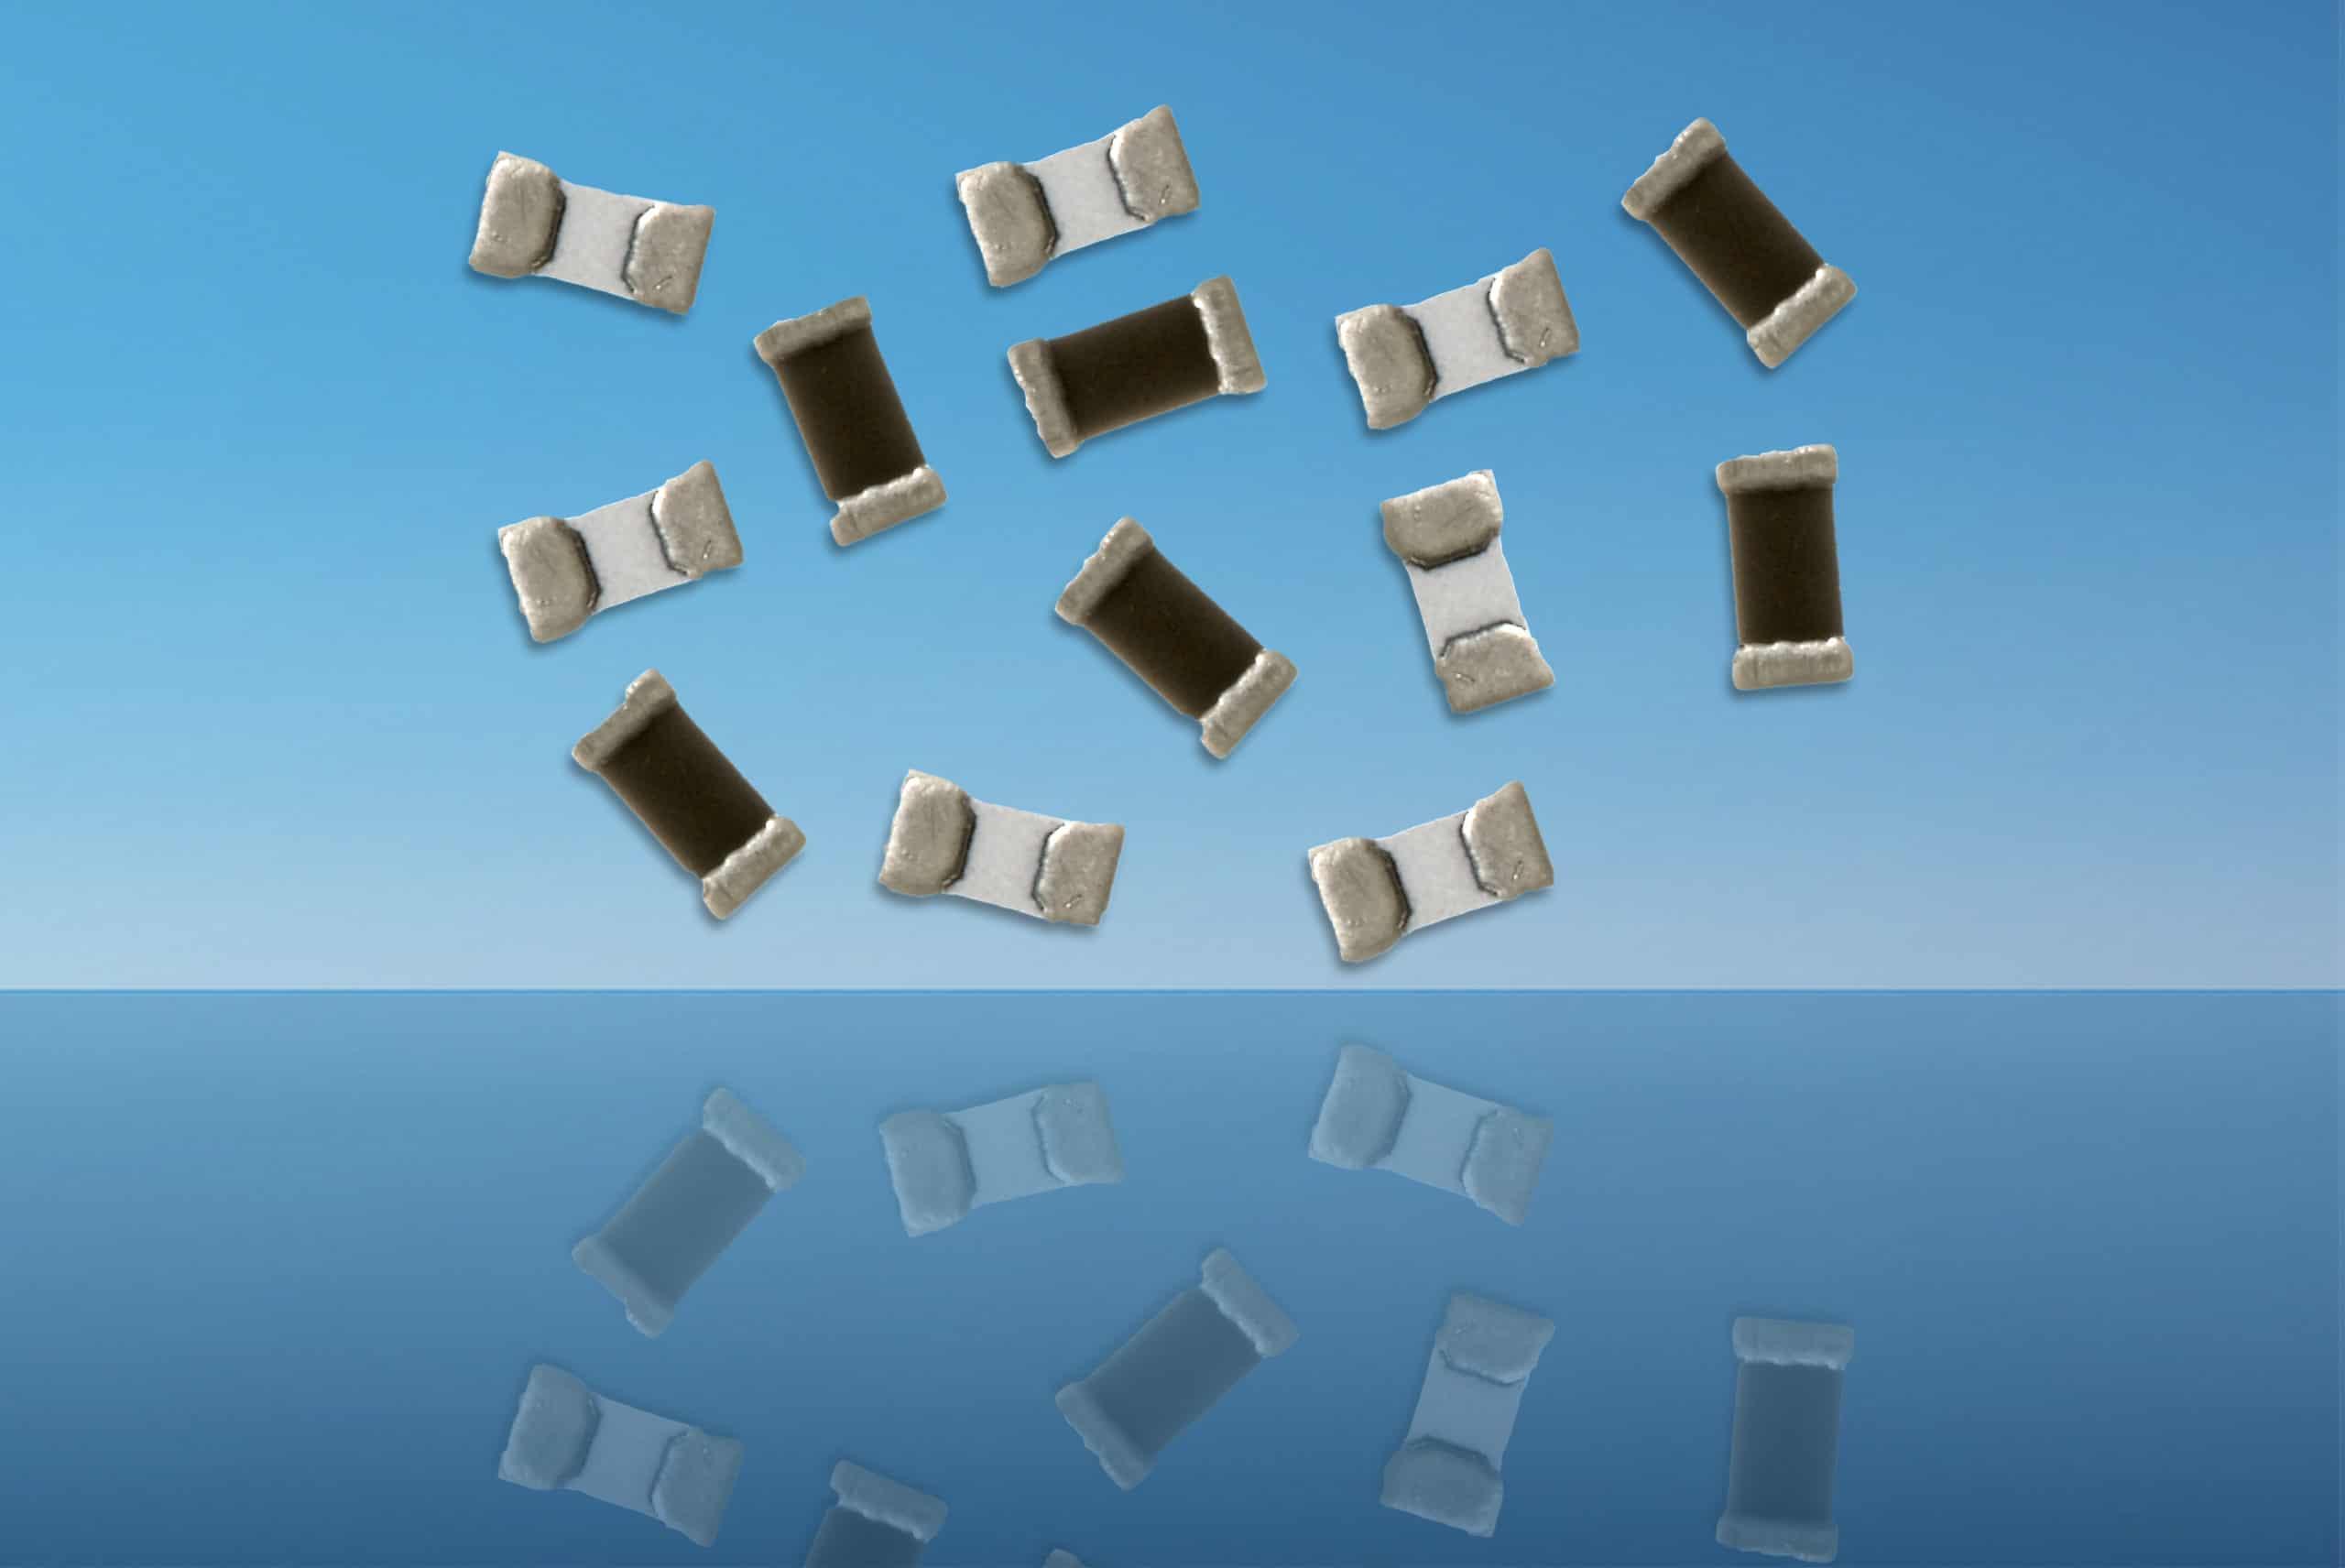 Metal foil on ceramic chip resistors from TT Electronics reduce form factor